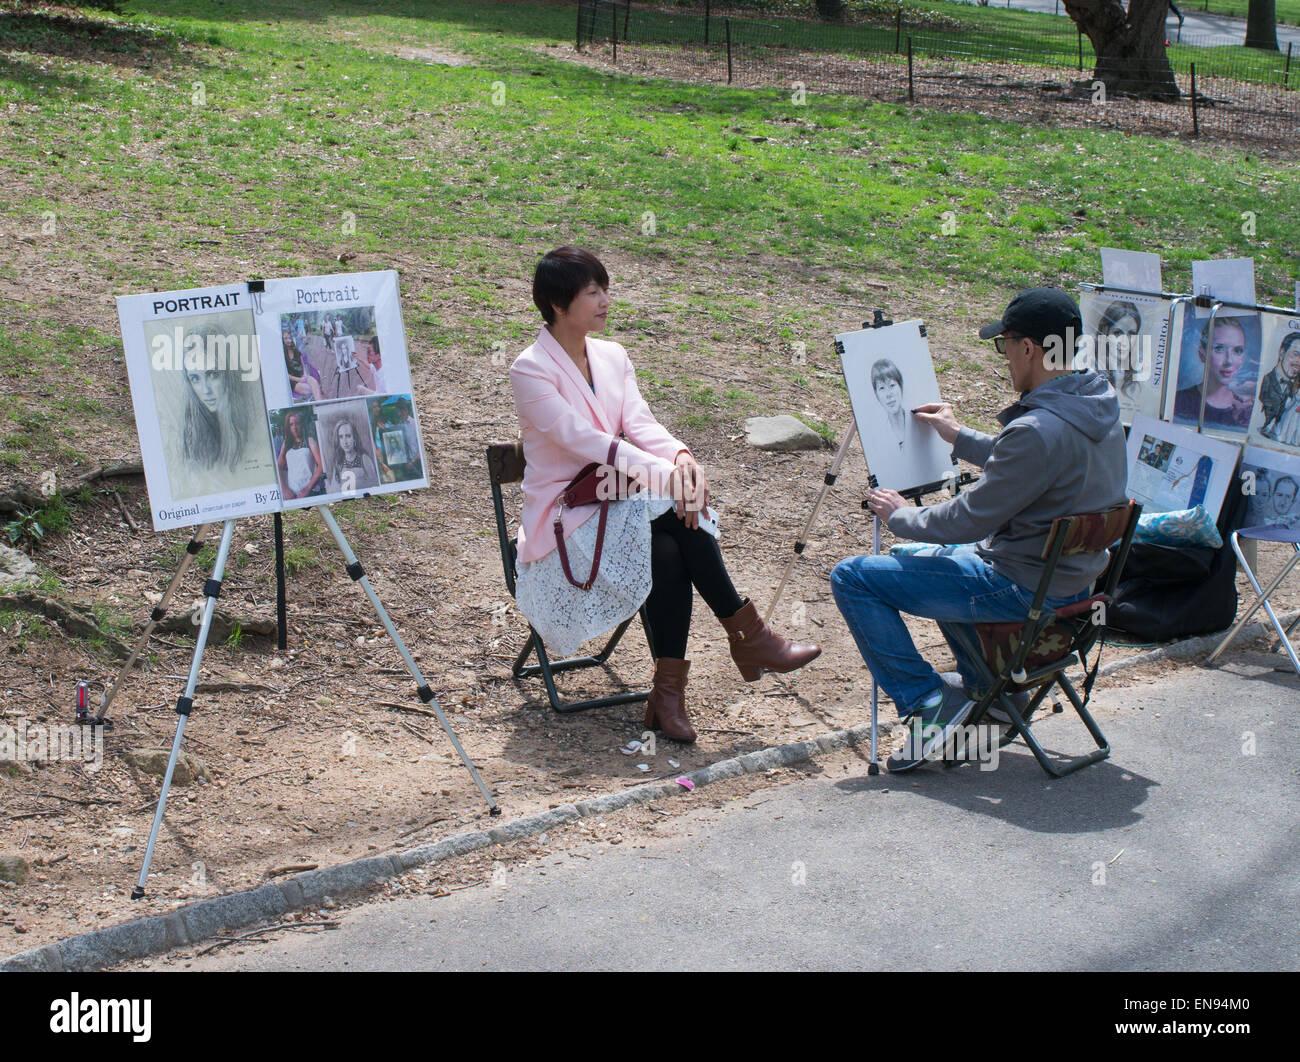 street-artist-drawing-a-portrait-sketch-